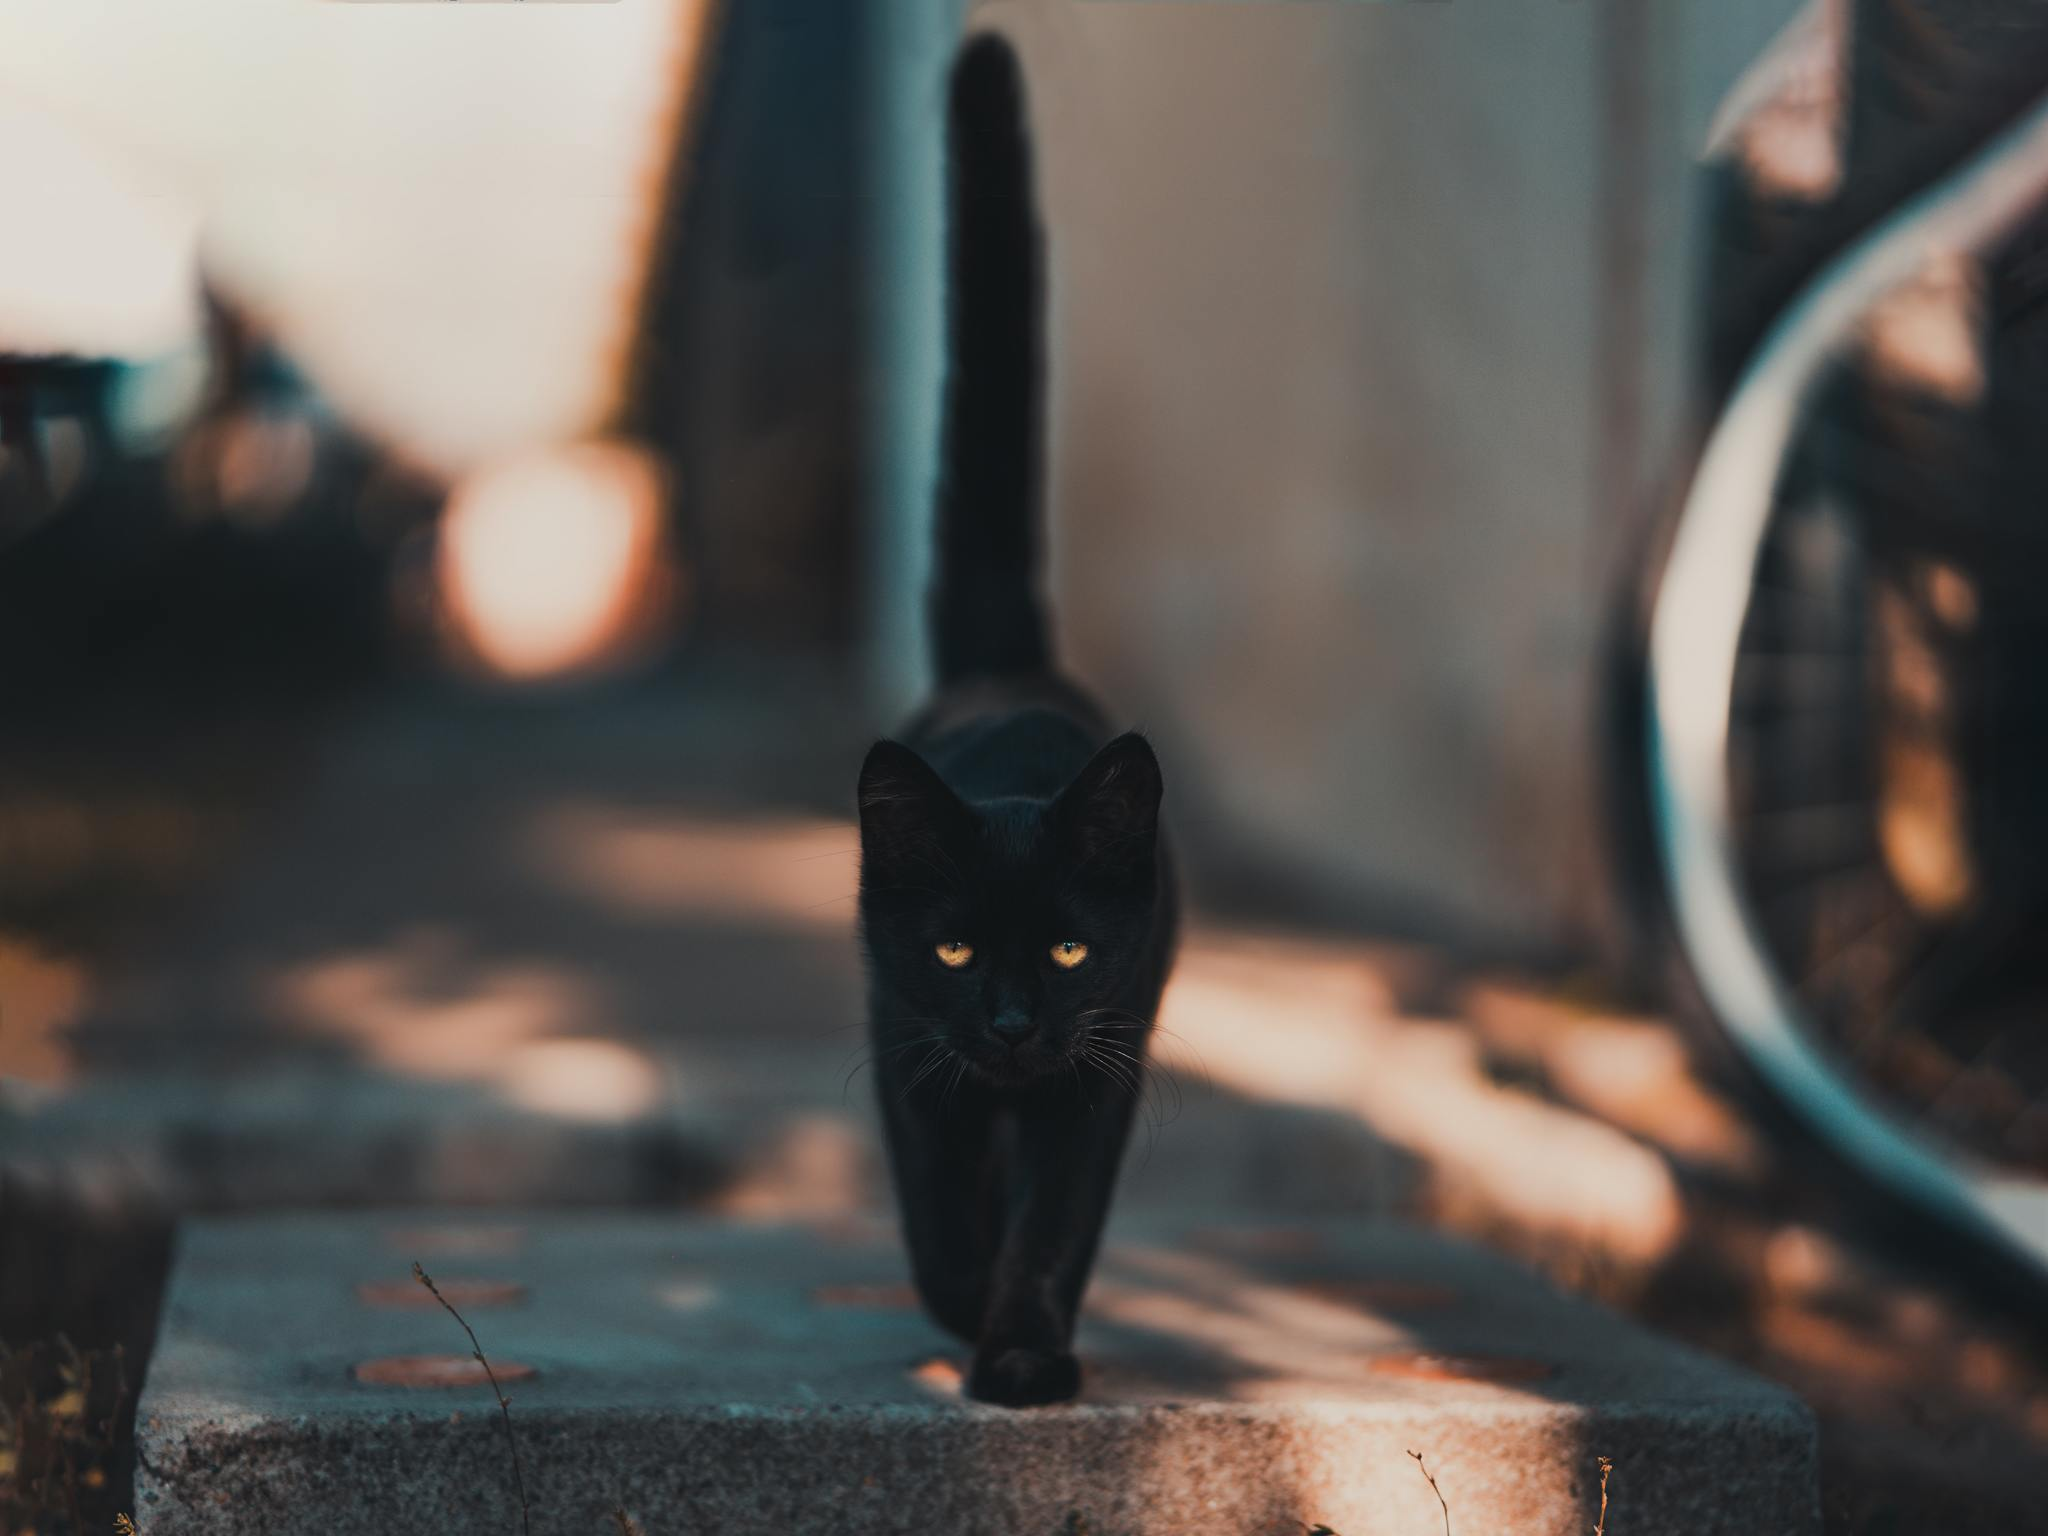 Eres la persona supersticiosa? фото